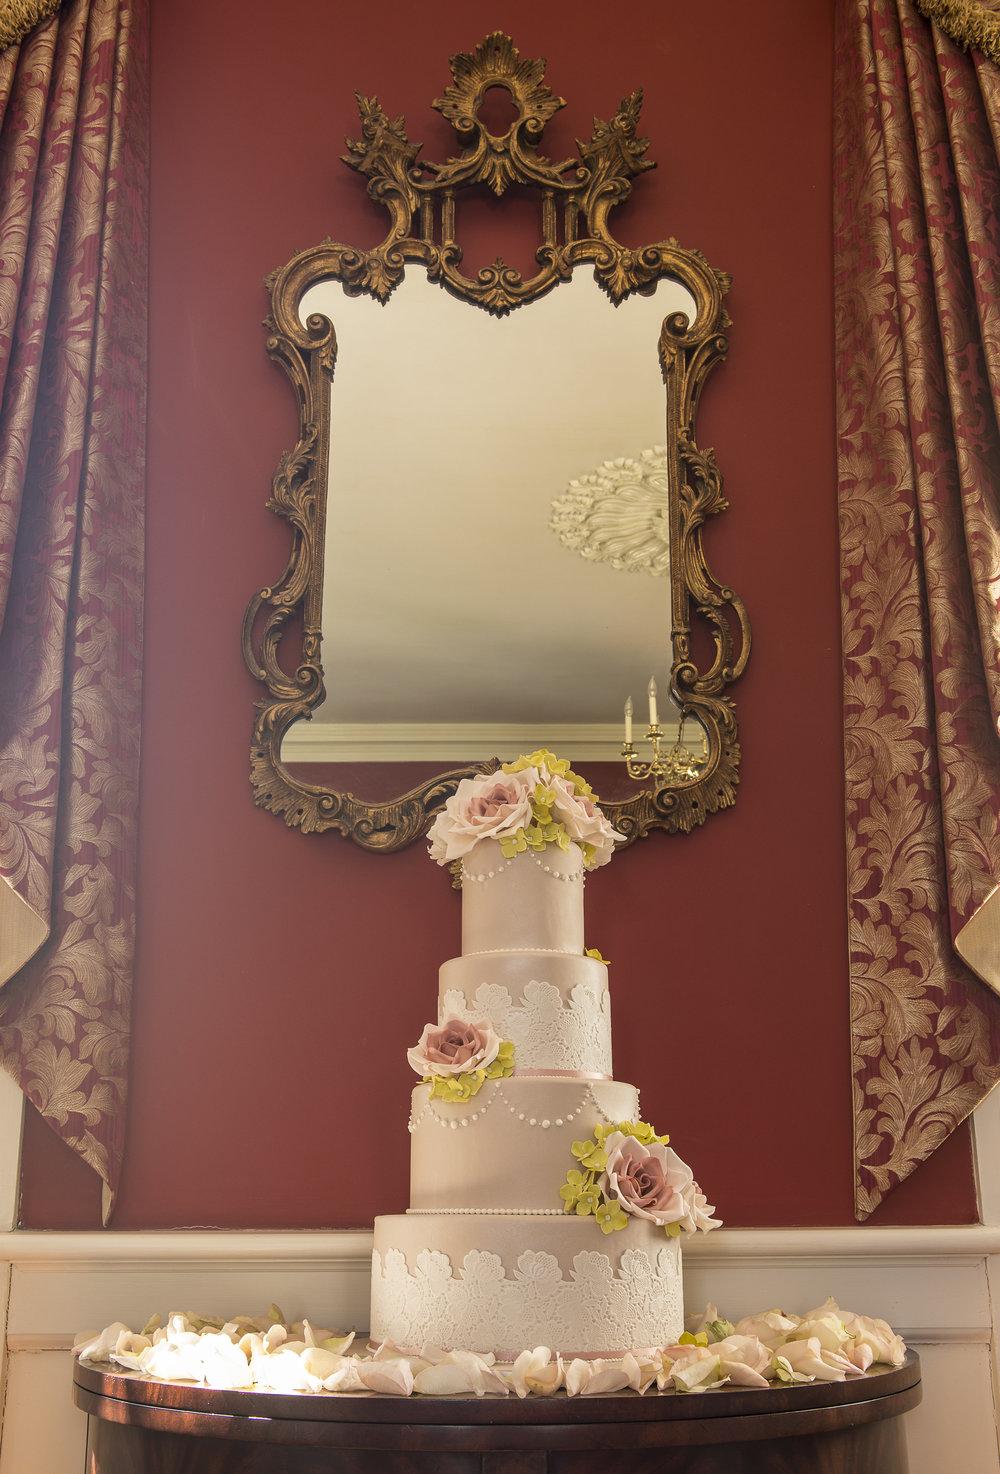 Brides and Weddings Shoot-belle grove style-0026.jpg